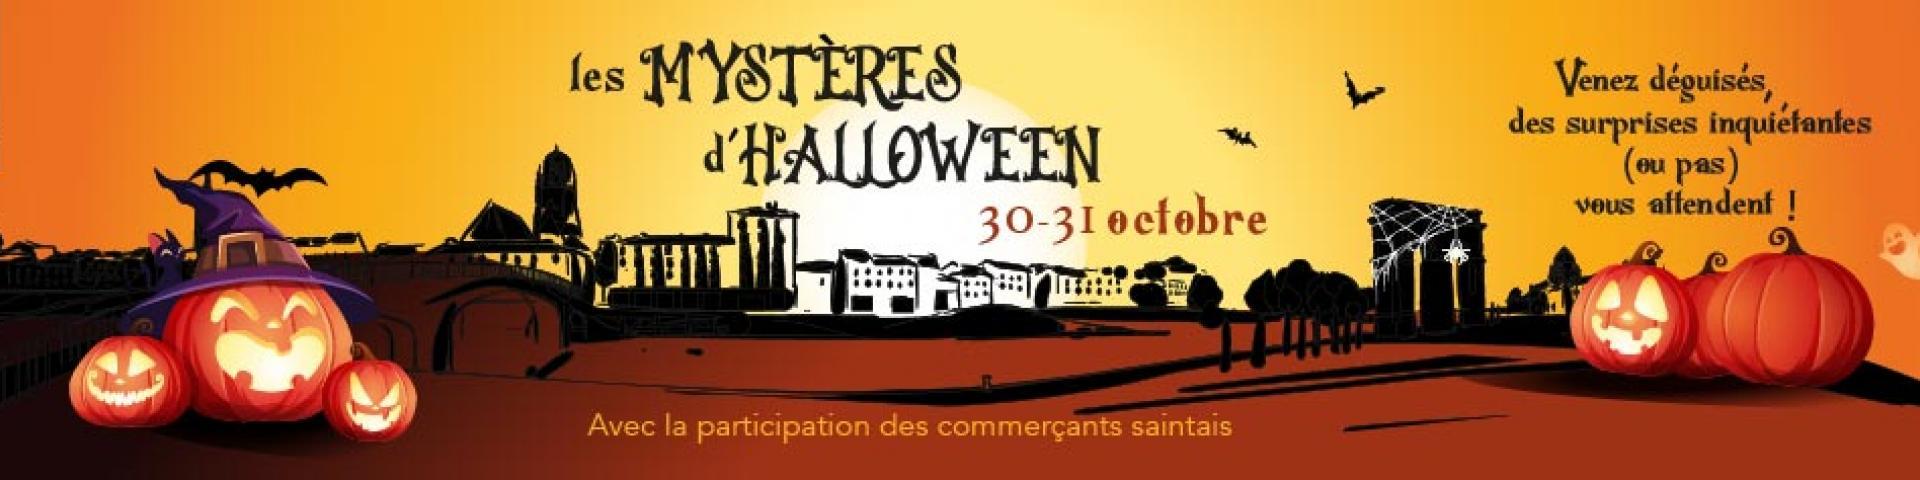 Bandeau-Halloween